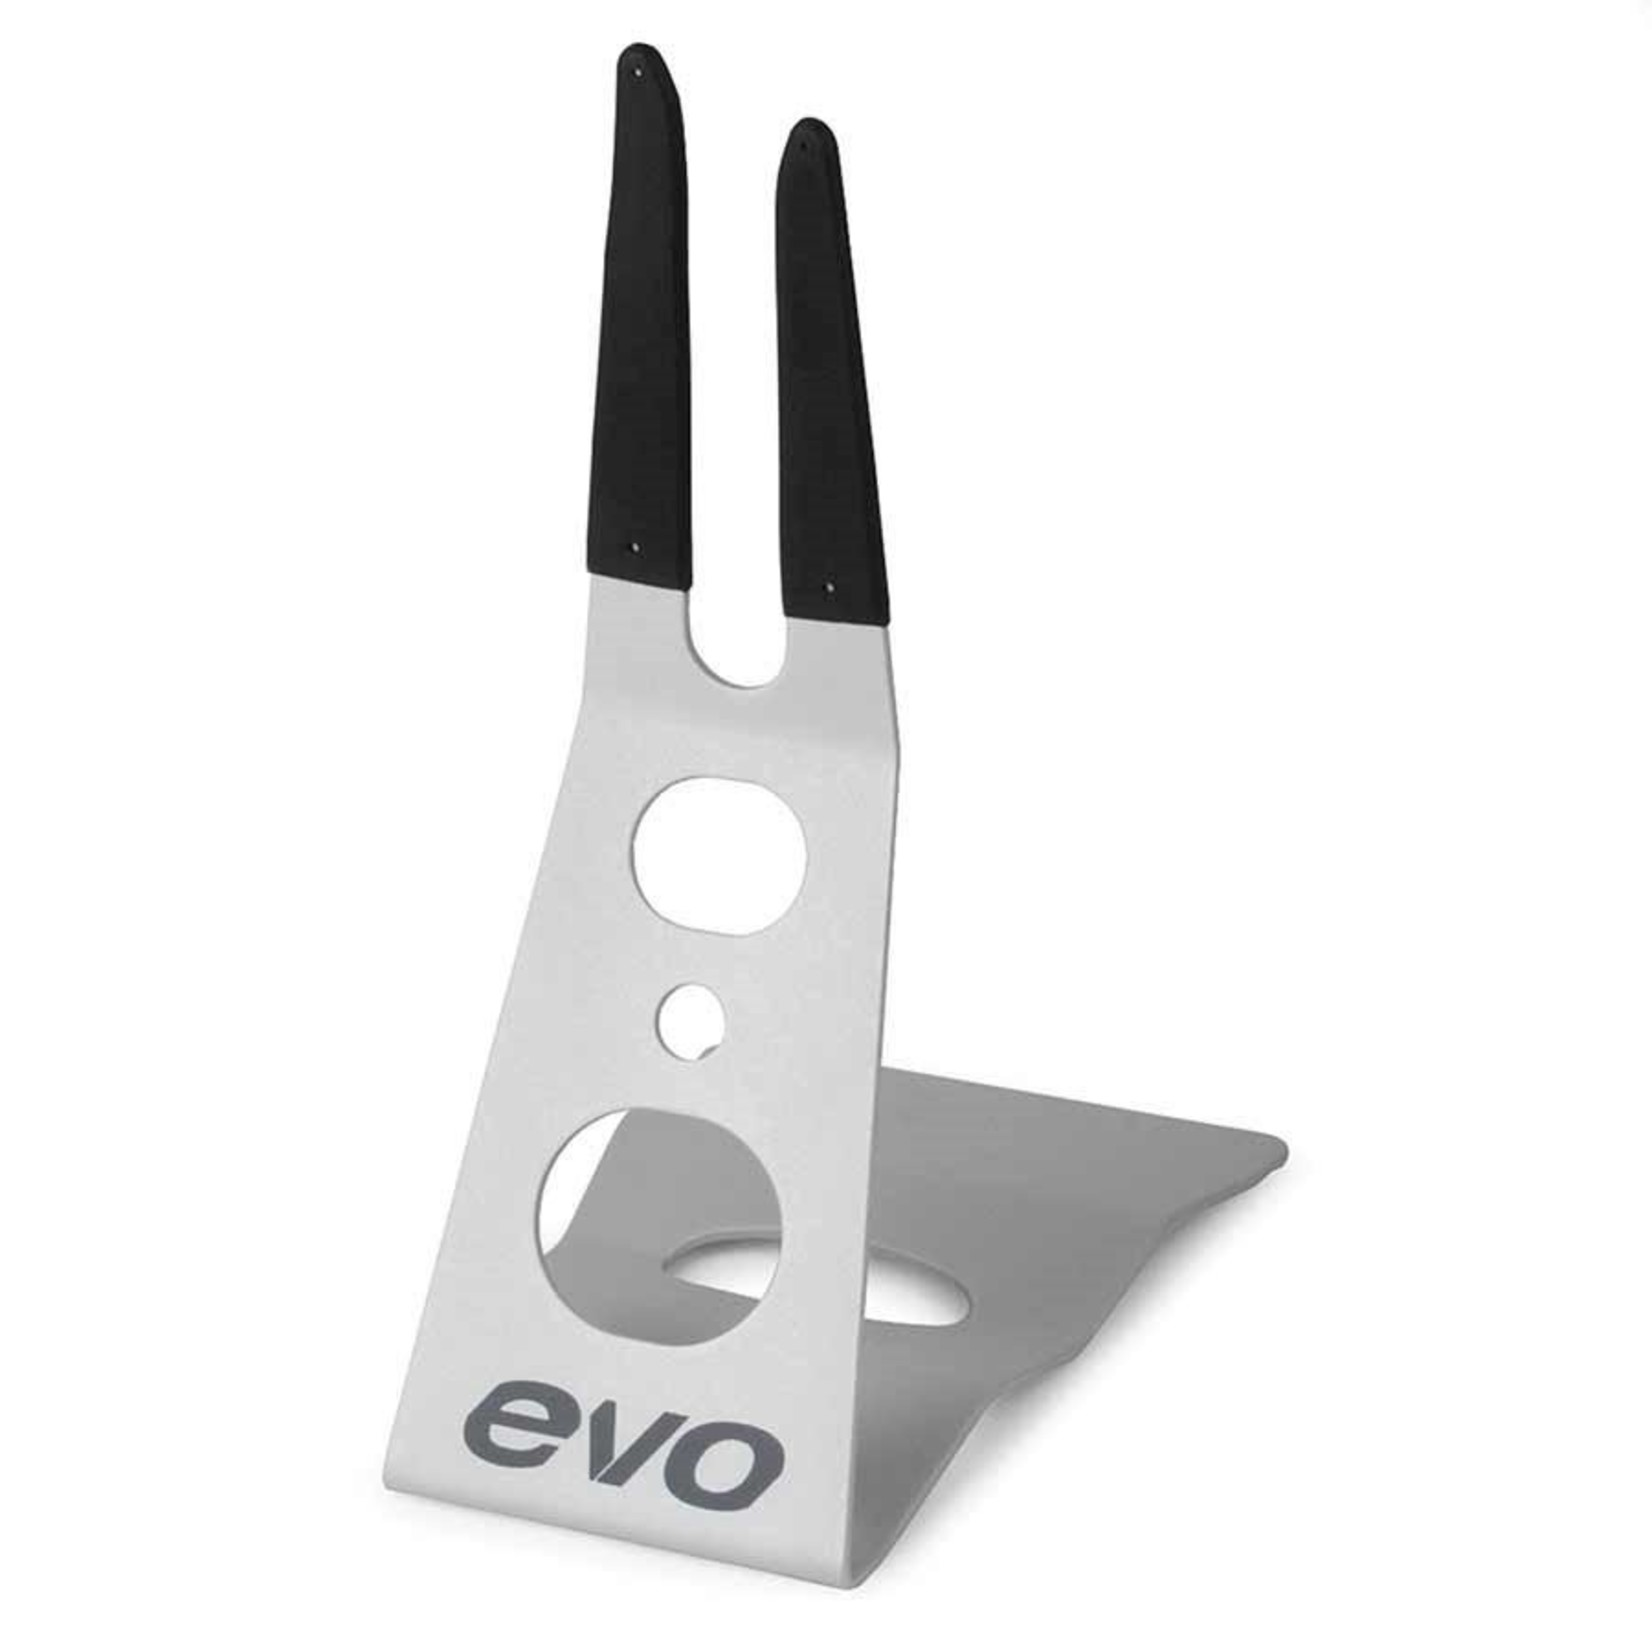 "Evo Evo Bicycle Stand Holder 20"" to 700C"